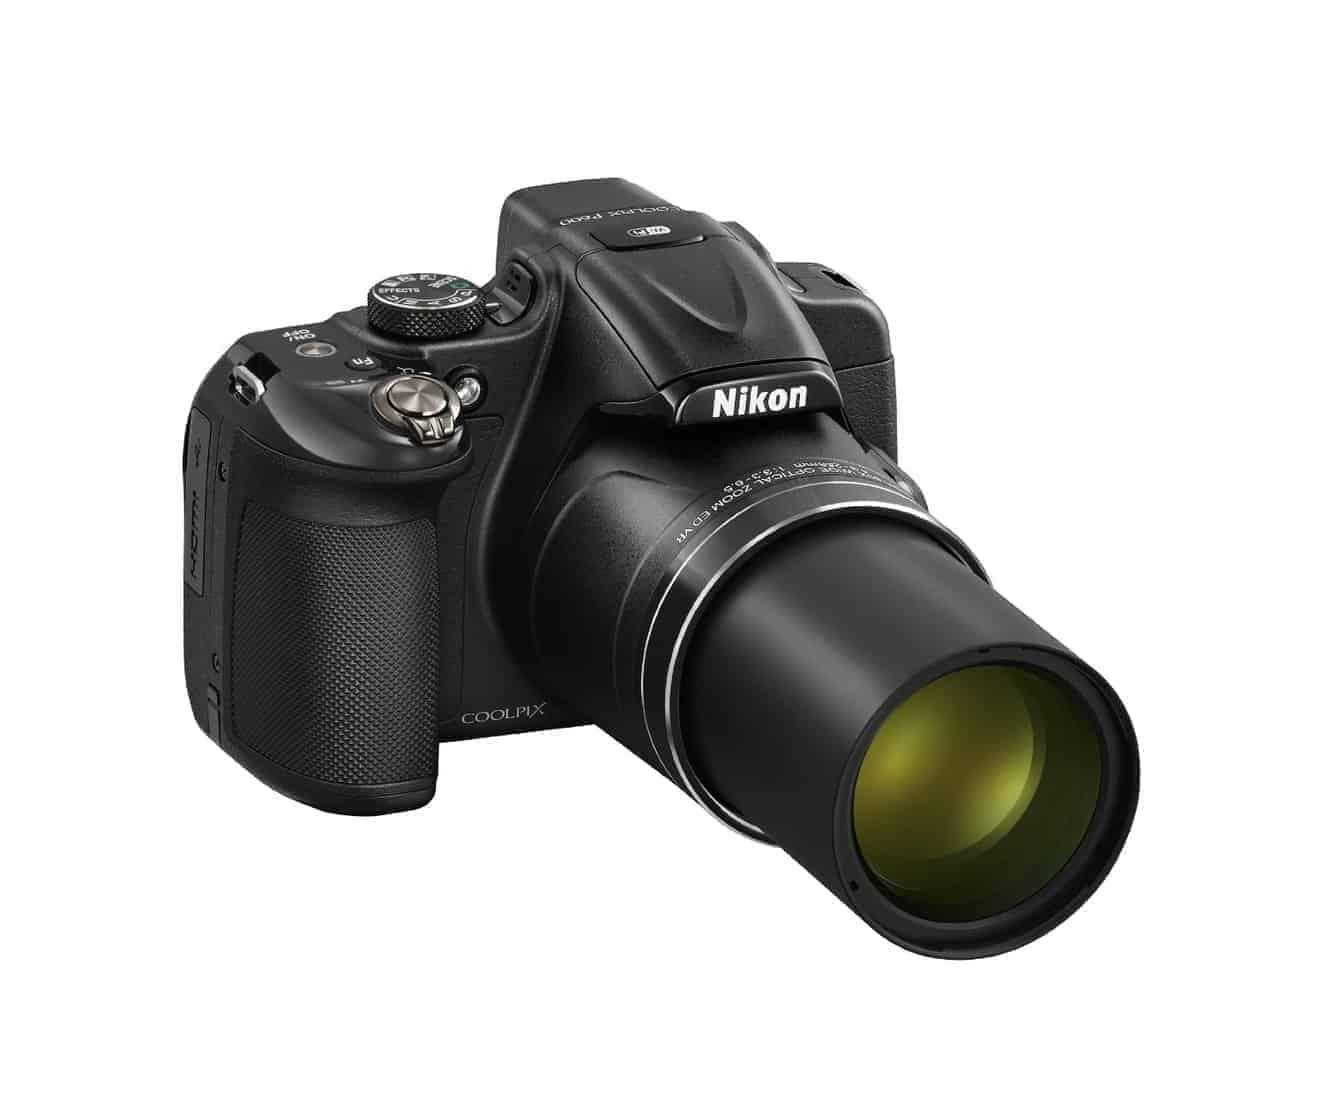 Camera Nikon Dslr Camera Range prime day deals cameras accessories batteries stark insider nikon coolpix p600 got range